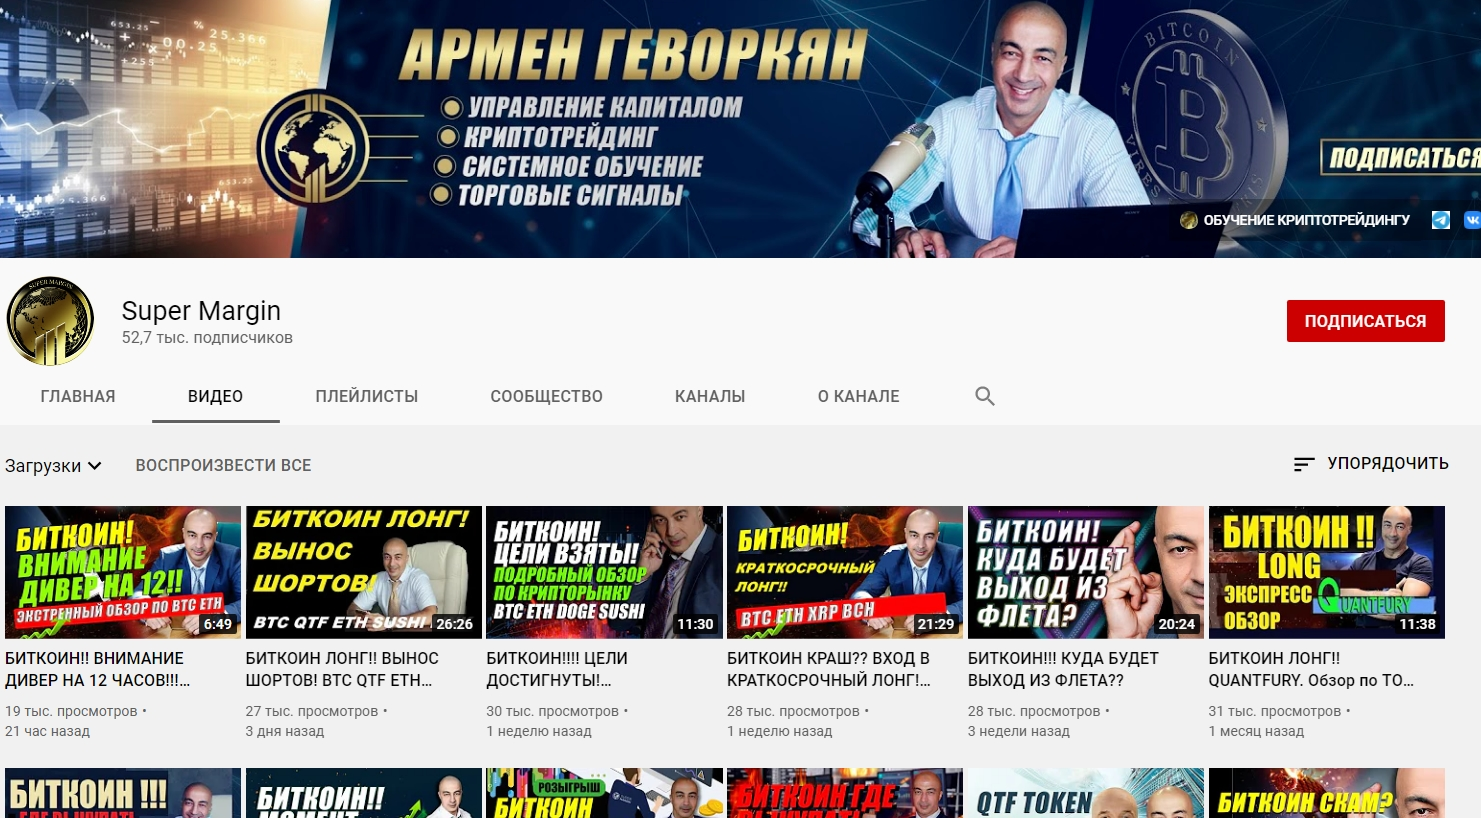 Ютуб канал Армена Геворкяна